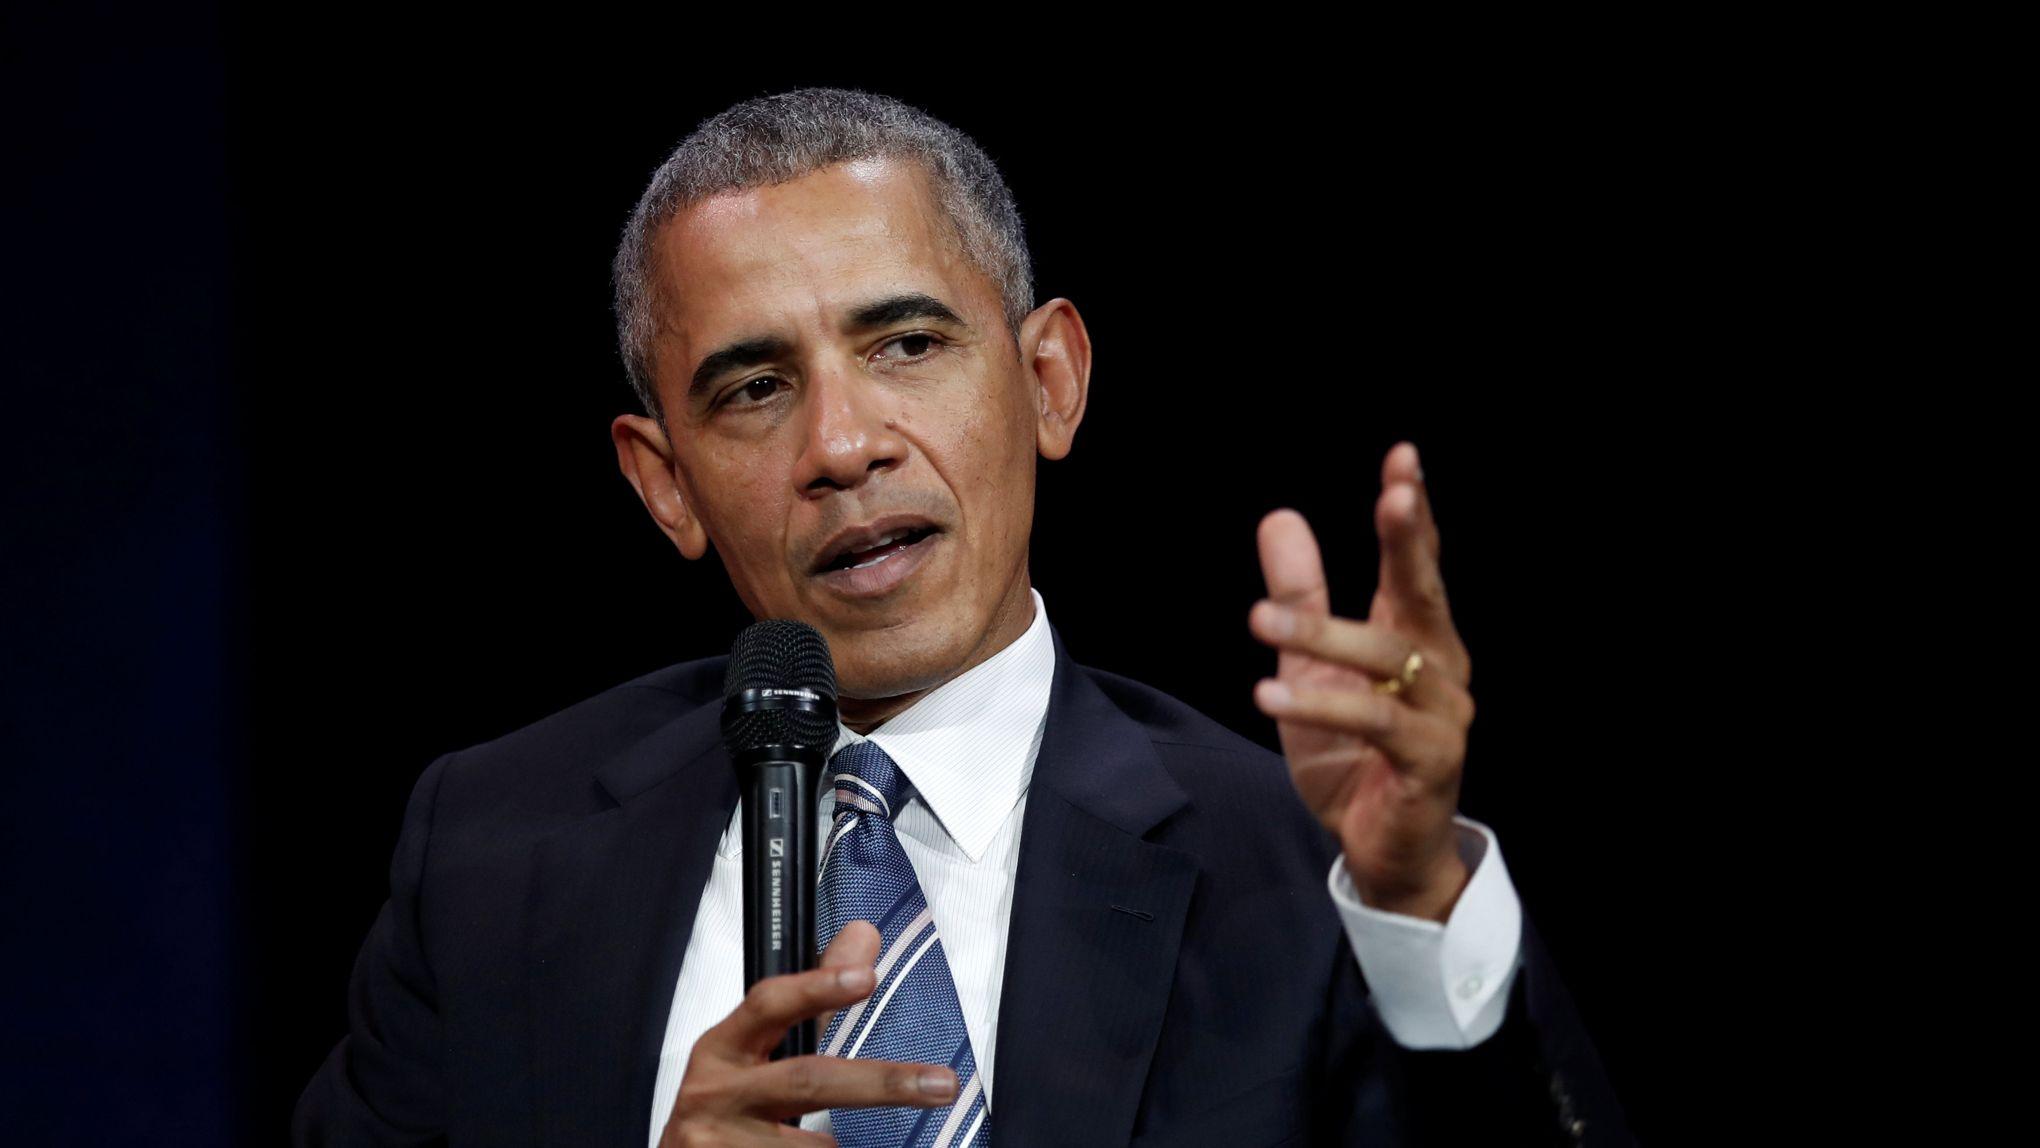 Barack Obama et les défis du changement global (Etudes africaines) (French Edition)